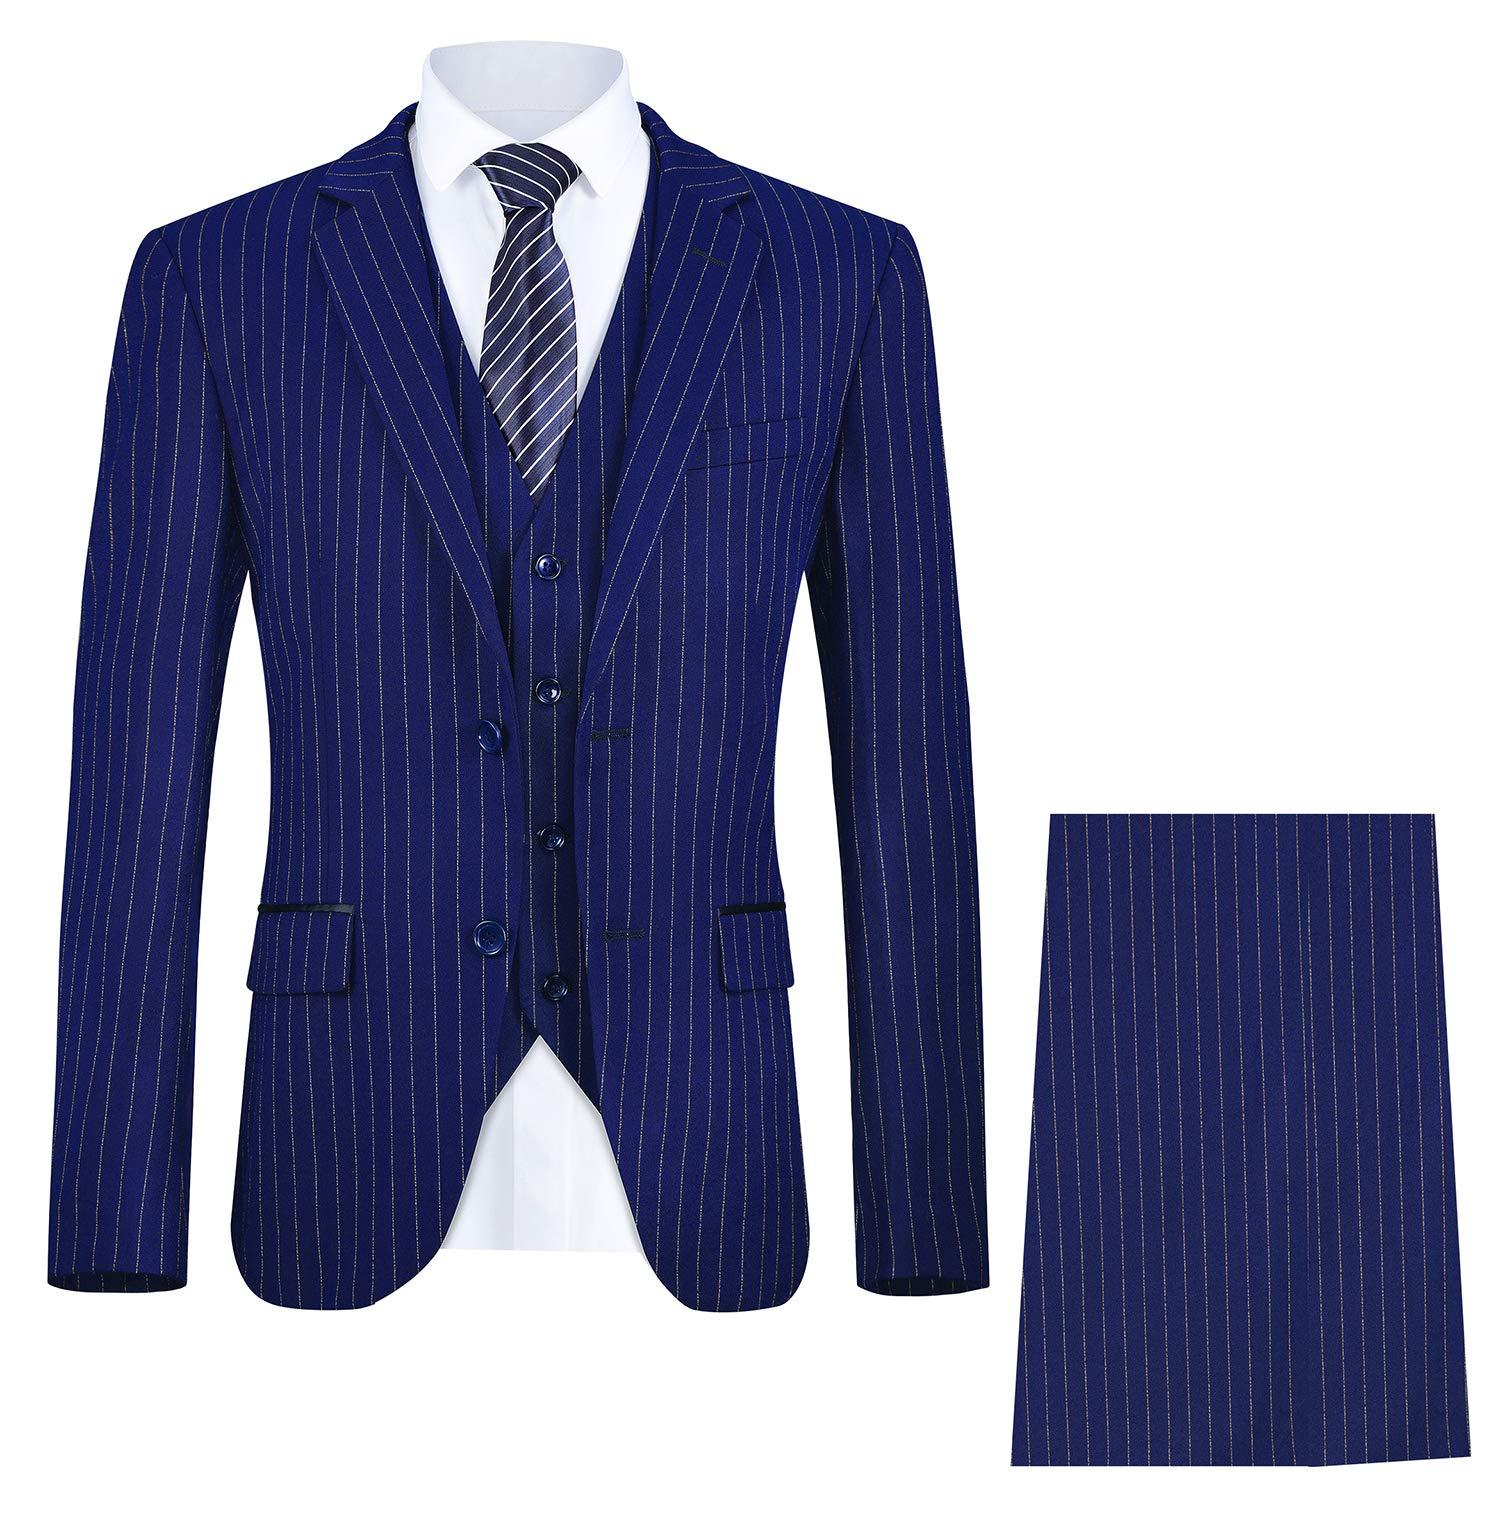 MAGE MALE Men's Pinstripe Suit Slim Fit 3 Piece Two-Button Business Wedding Party Blazer Vest& Pants Sets by MAGE MALE